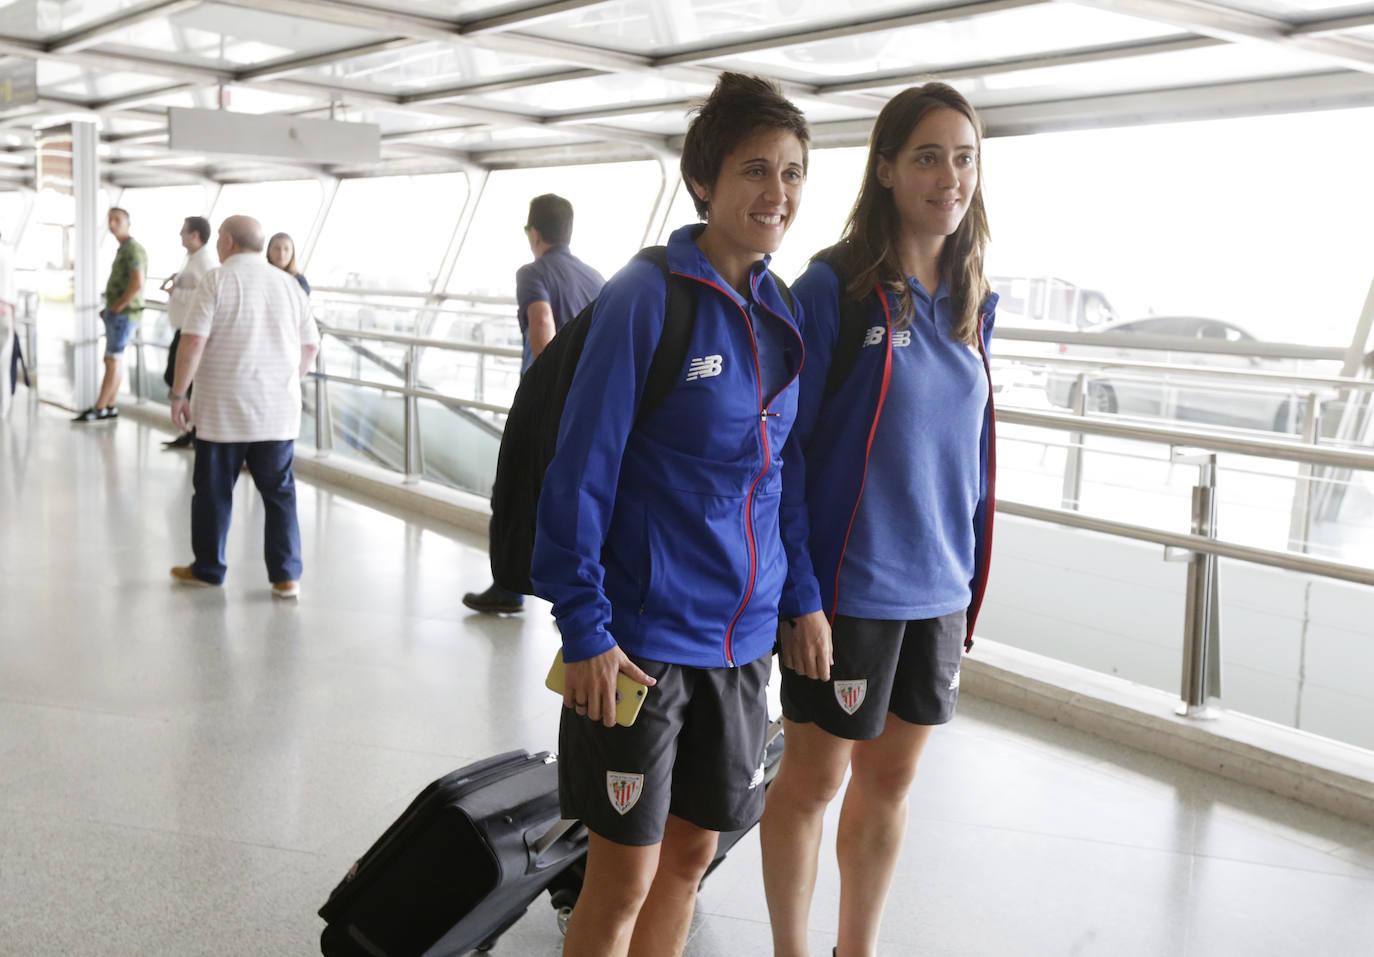 La llegada del Athletic a Loiu, en imágenes